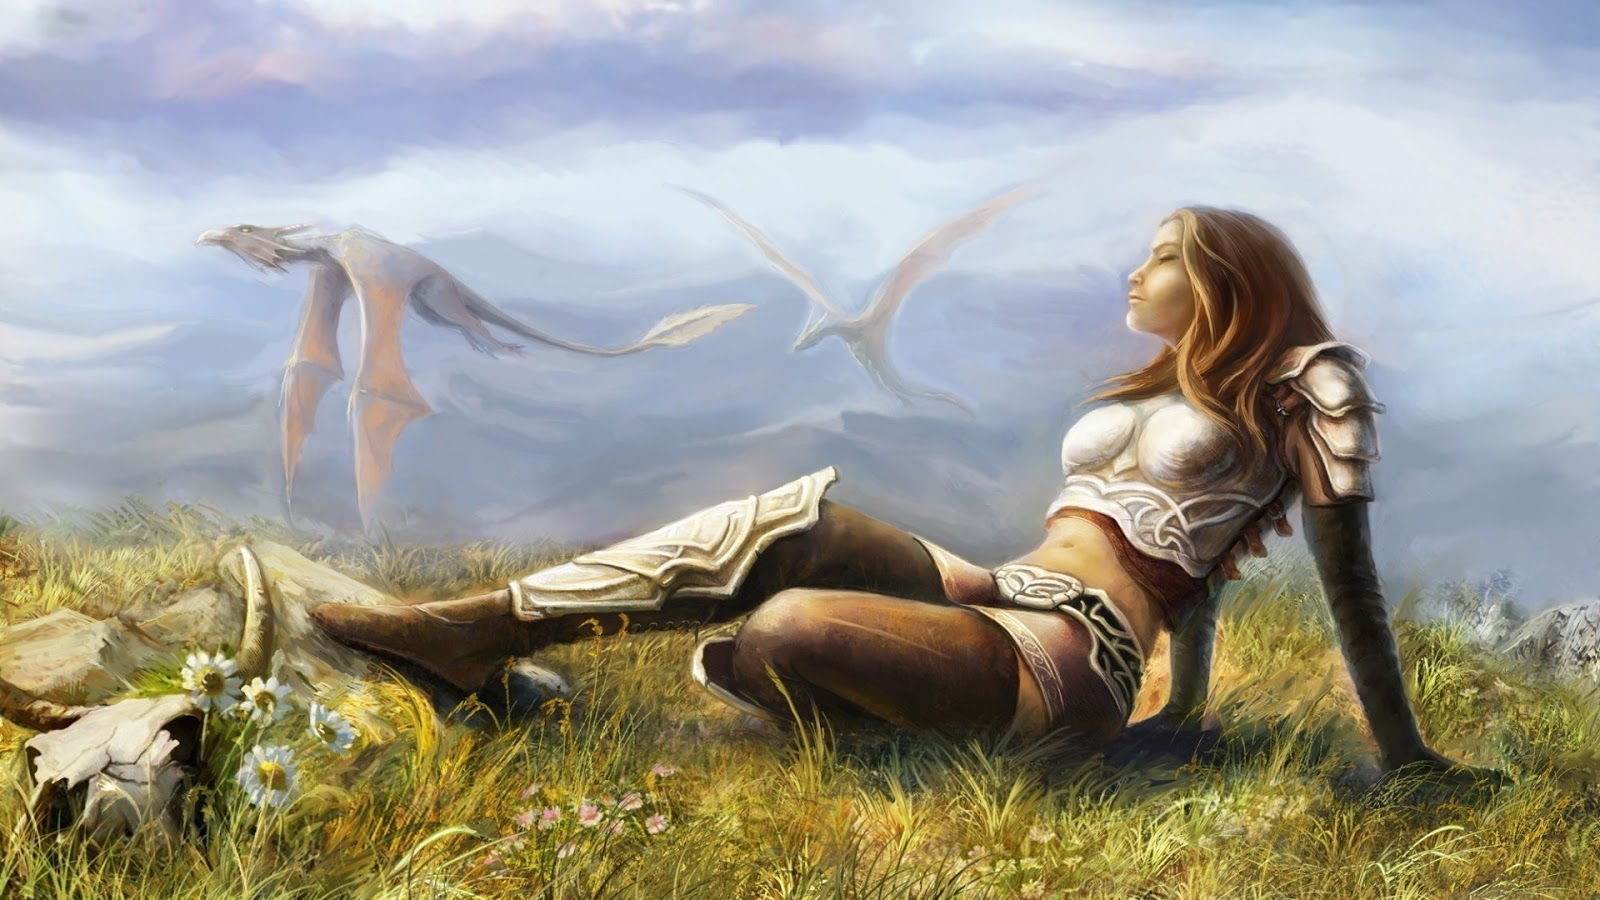 Girl And Dragon Fantasy Wallpaper